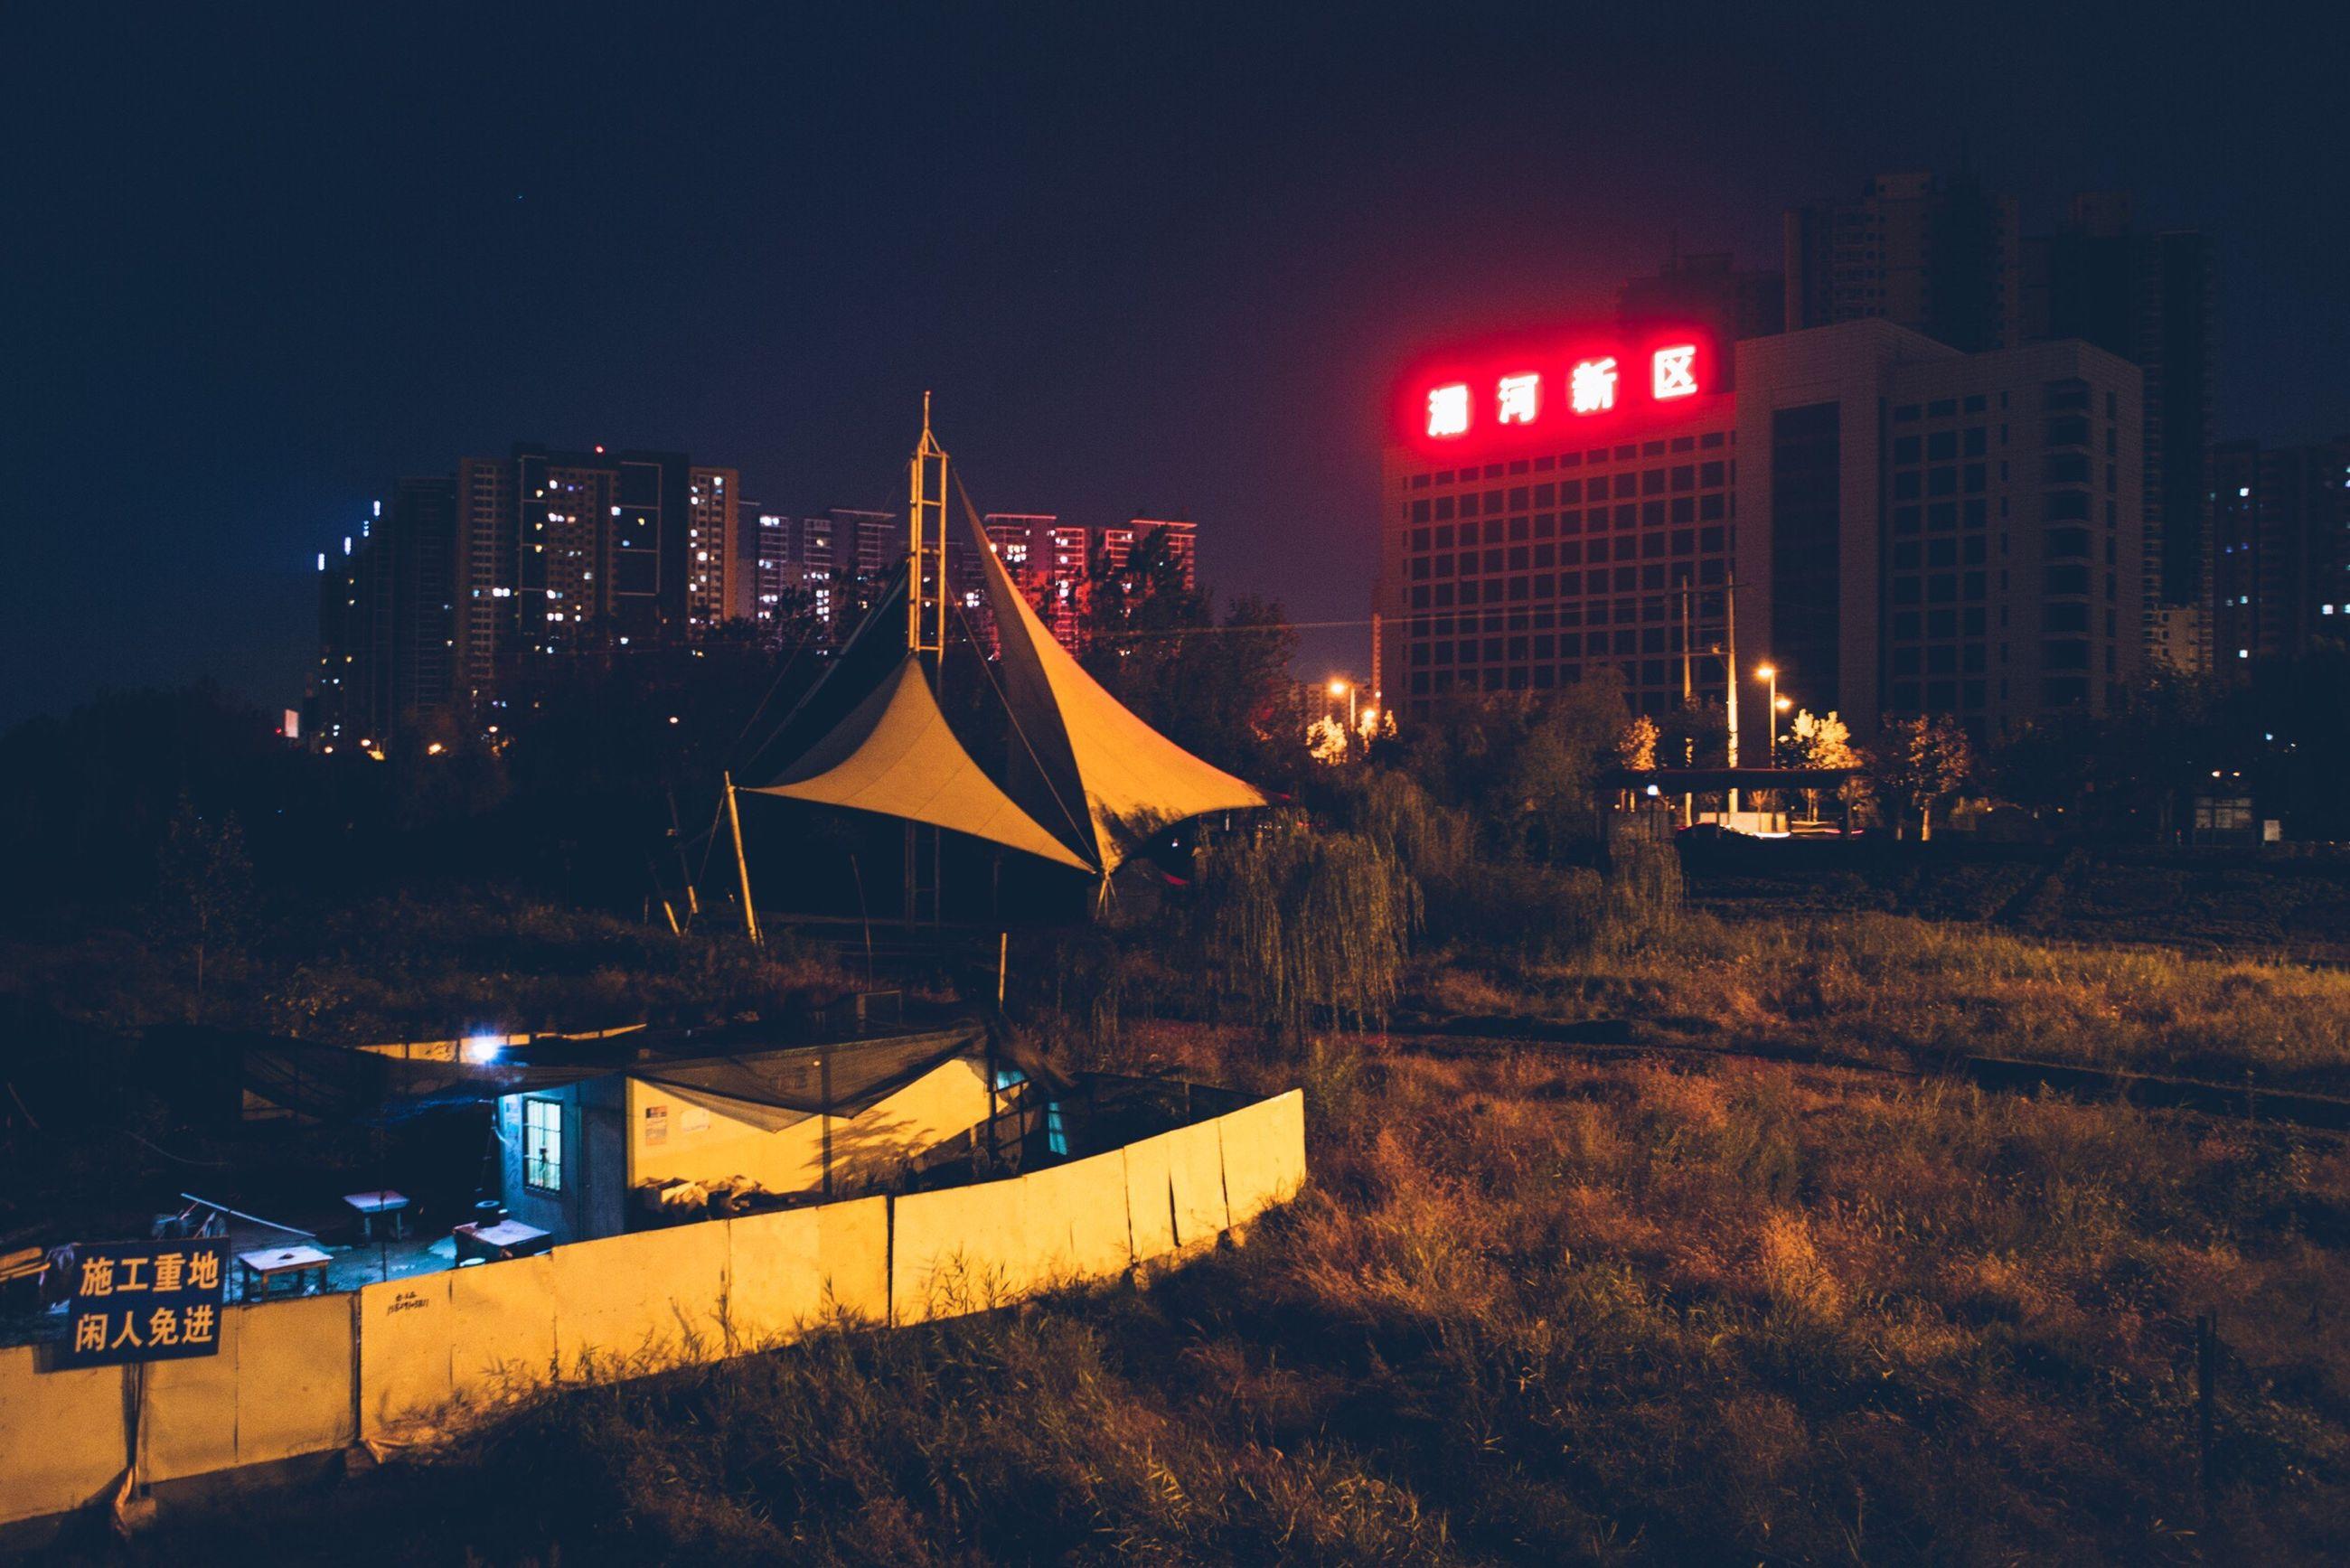 illuminated, night, building exterior, architecture, built structure, city, sky, city life, skyscraper, tower, tall - high, dark, growth, outdoors, neon, office building, modern, development, urban skyline